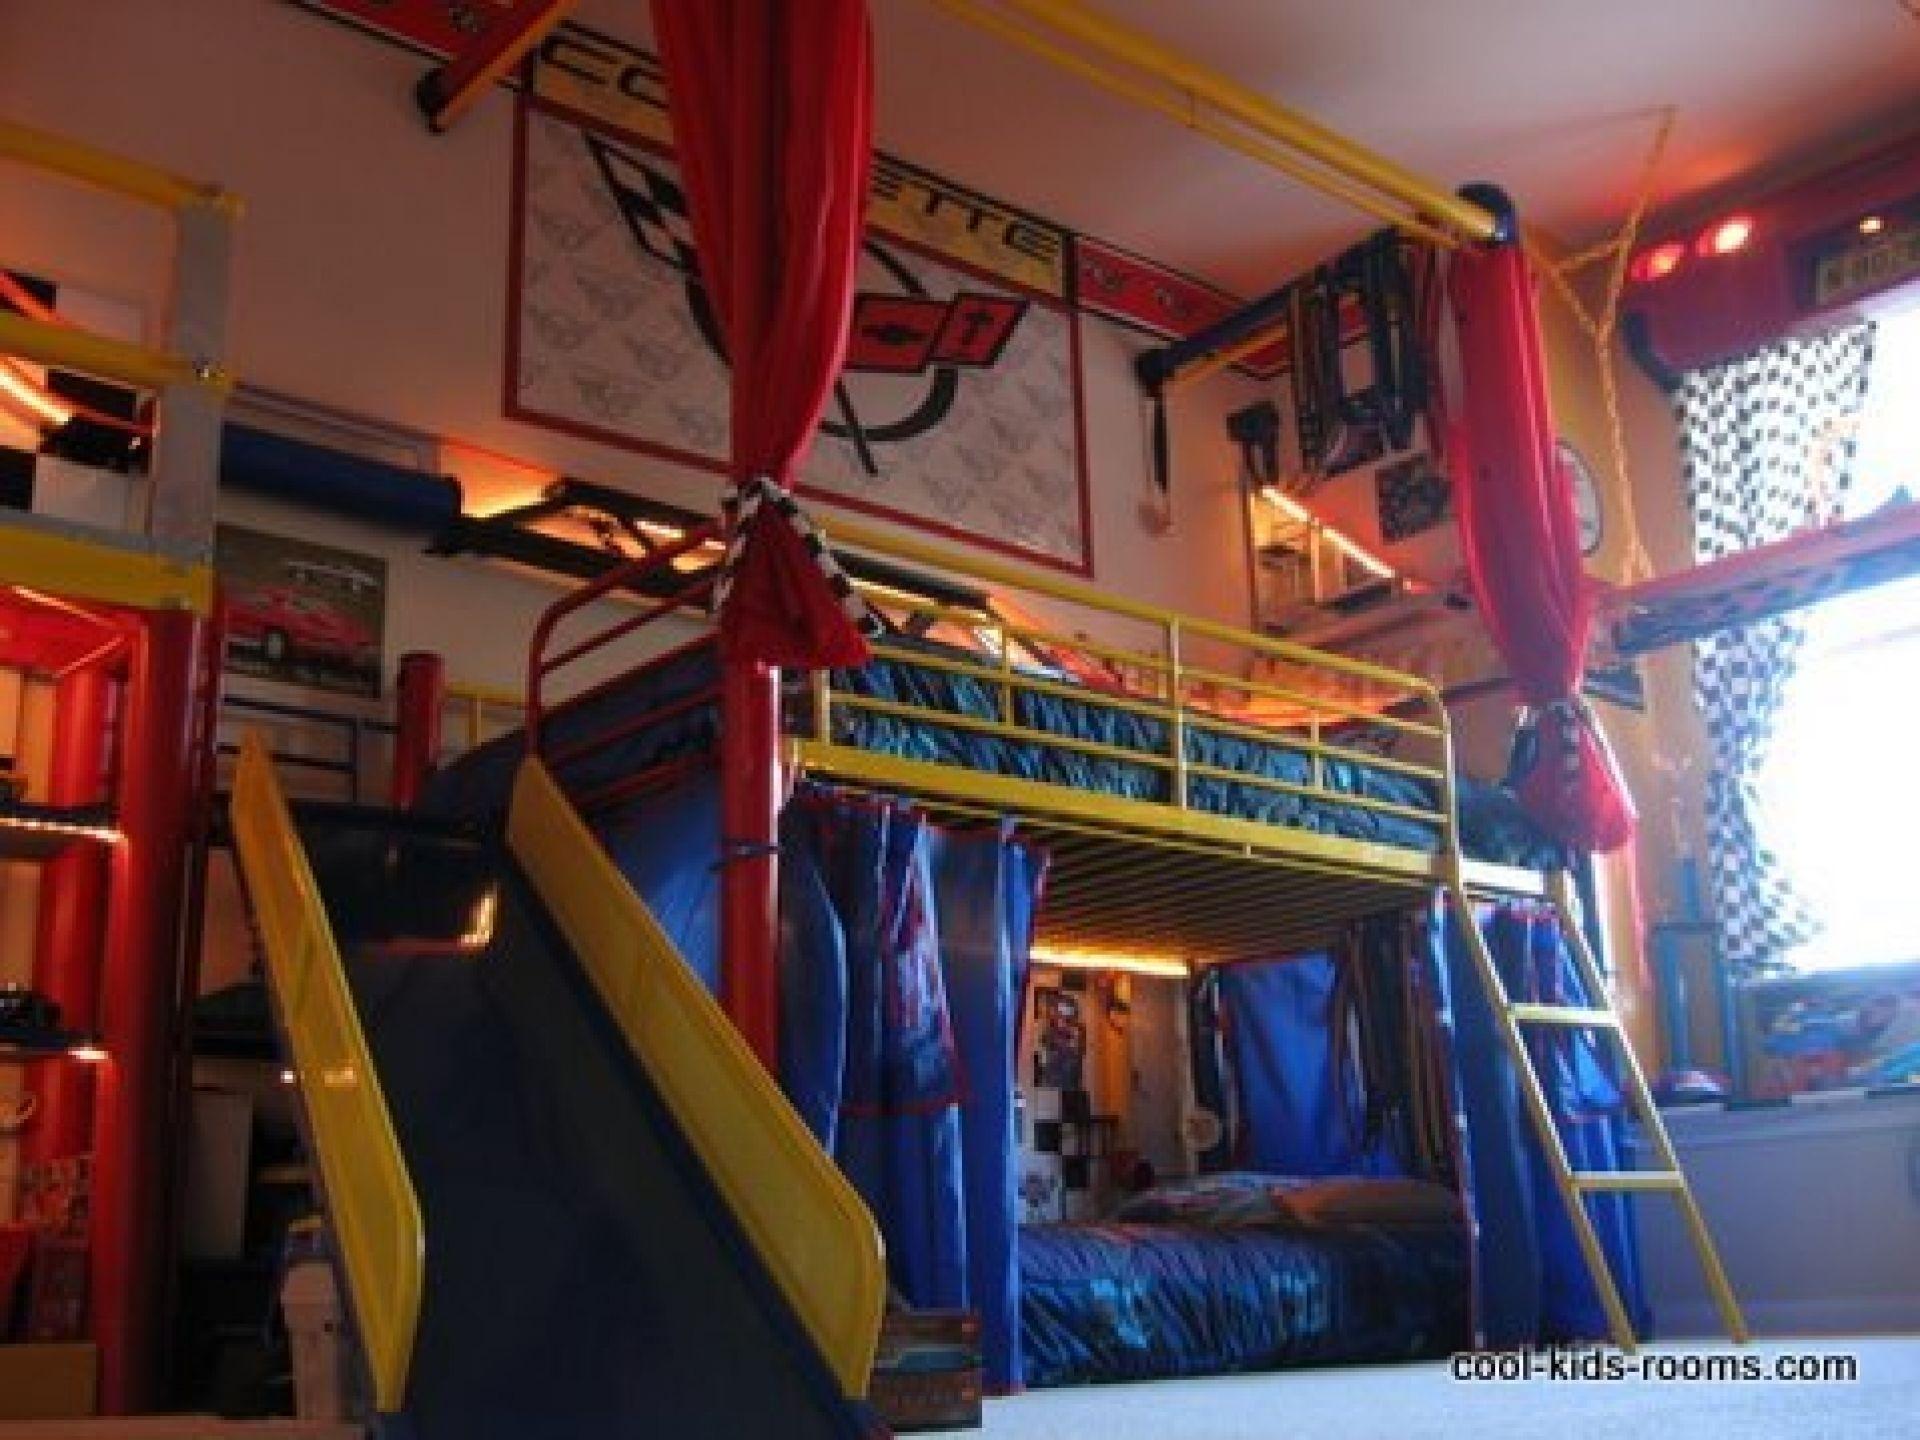 Boys Bedrooms Designs Beauteous Bedroom Ideas Boy Design Bedroom Design Ideas Boy Excerpt Teen Boy Decorating Design